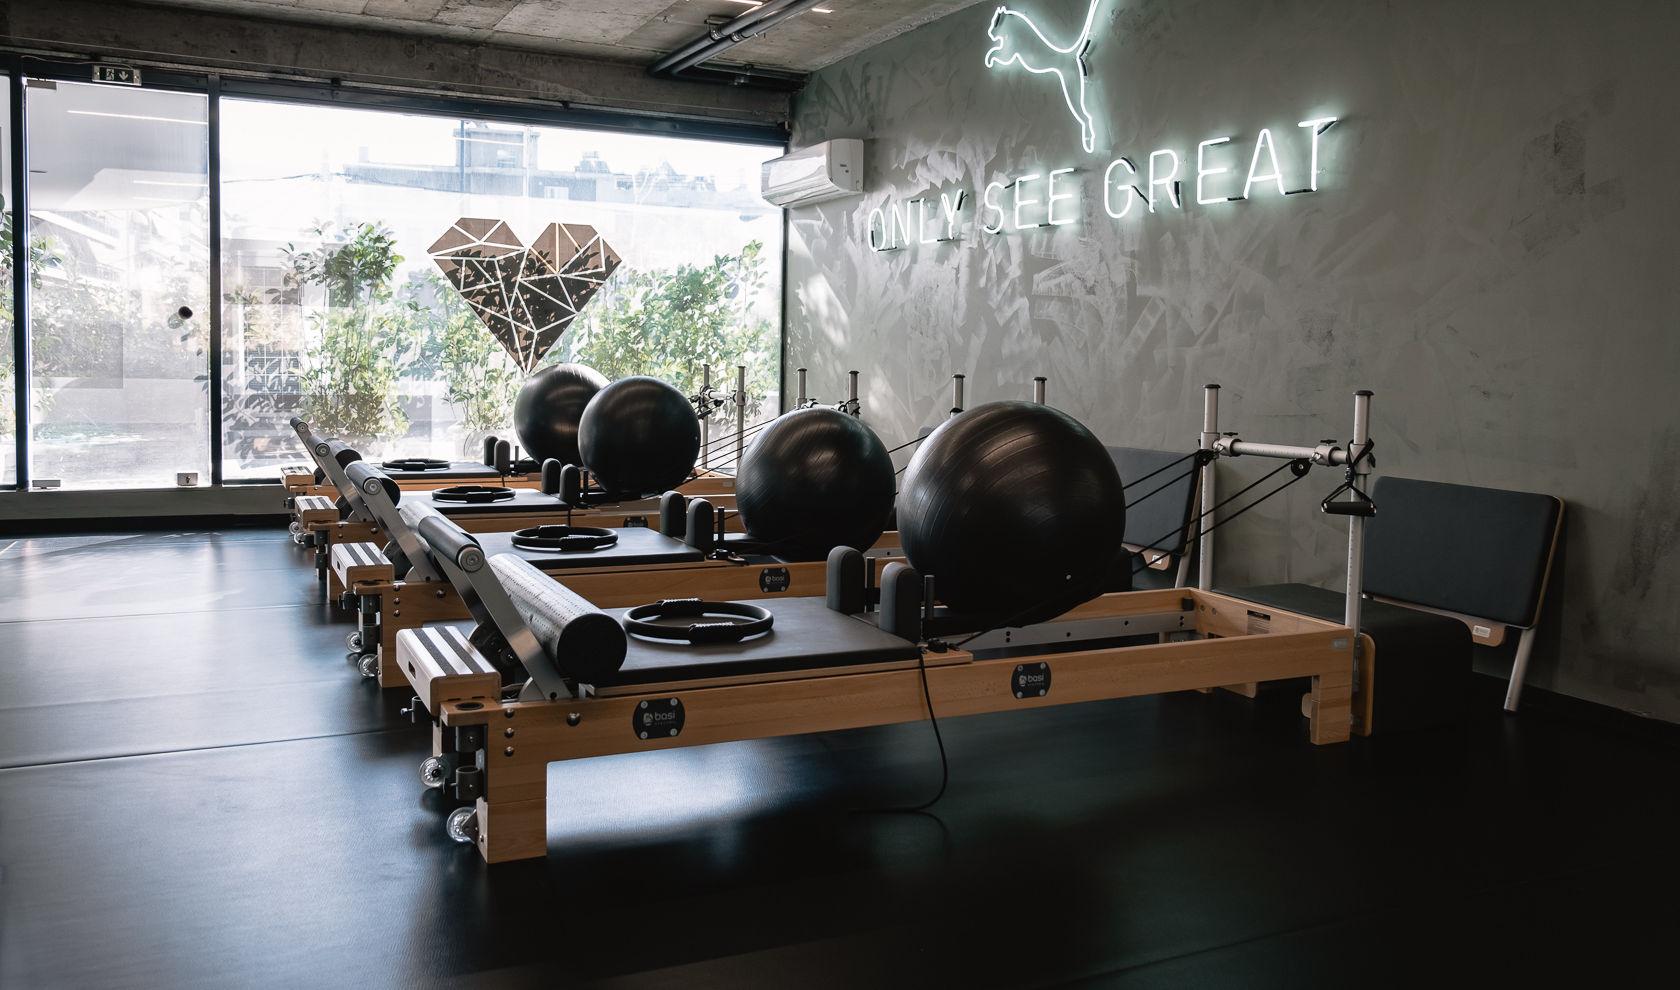 Pilates Reformer: